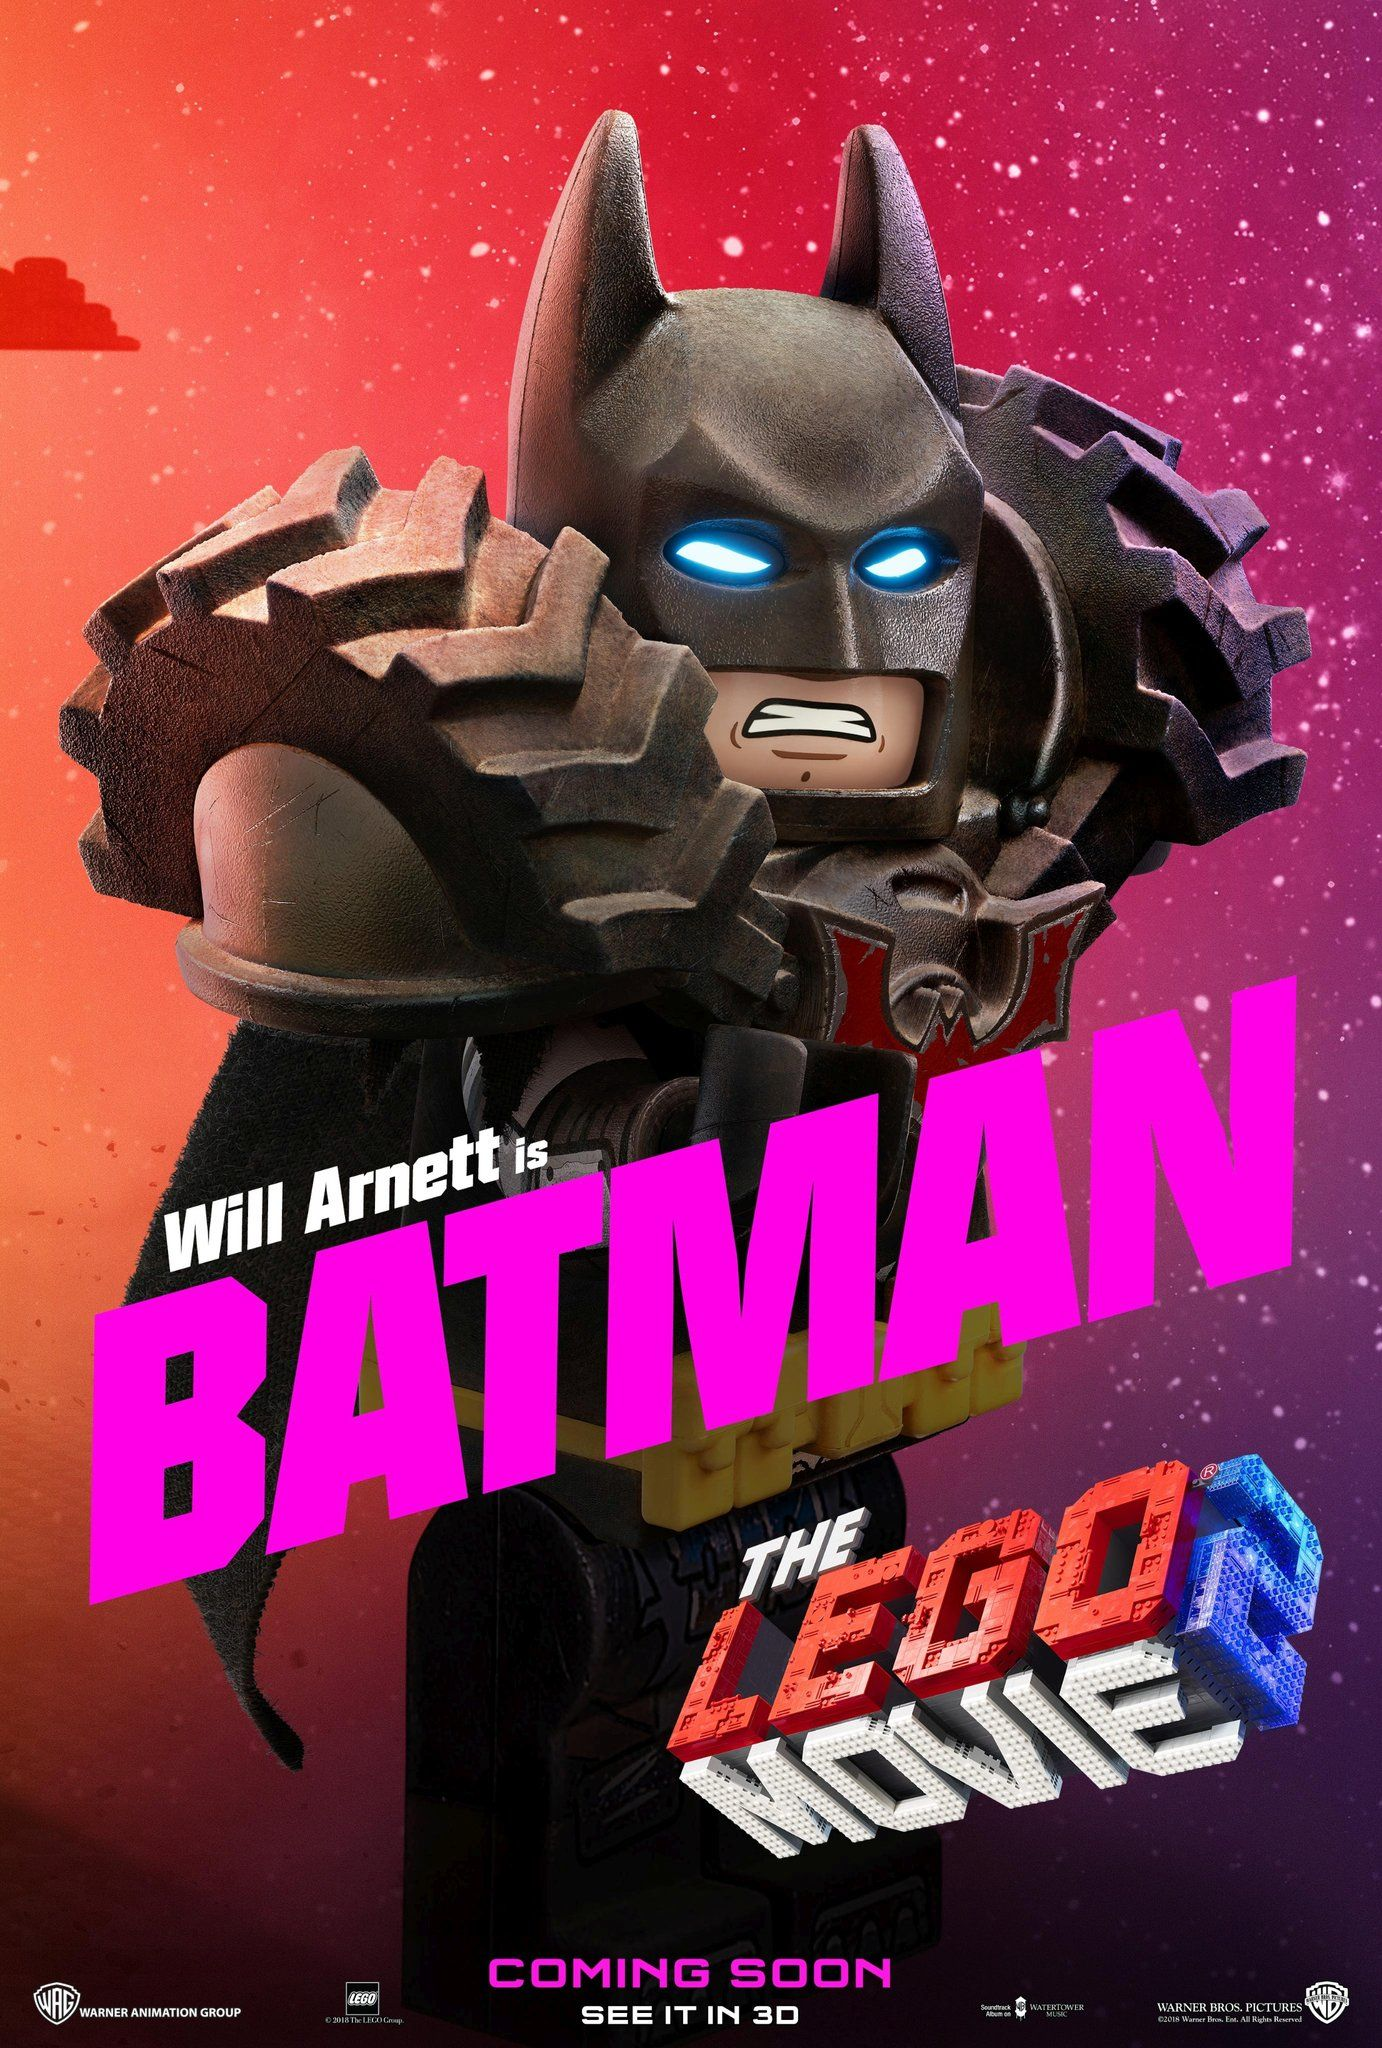 Will Arnett E Batman Em Thelegomovie2 Umaaventuralego2 Uma